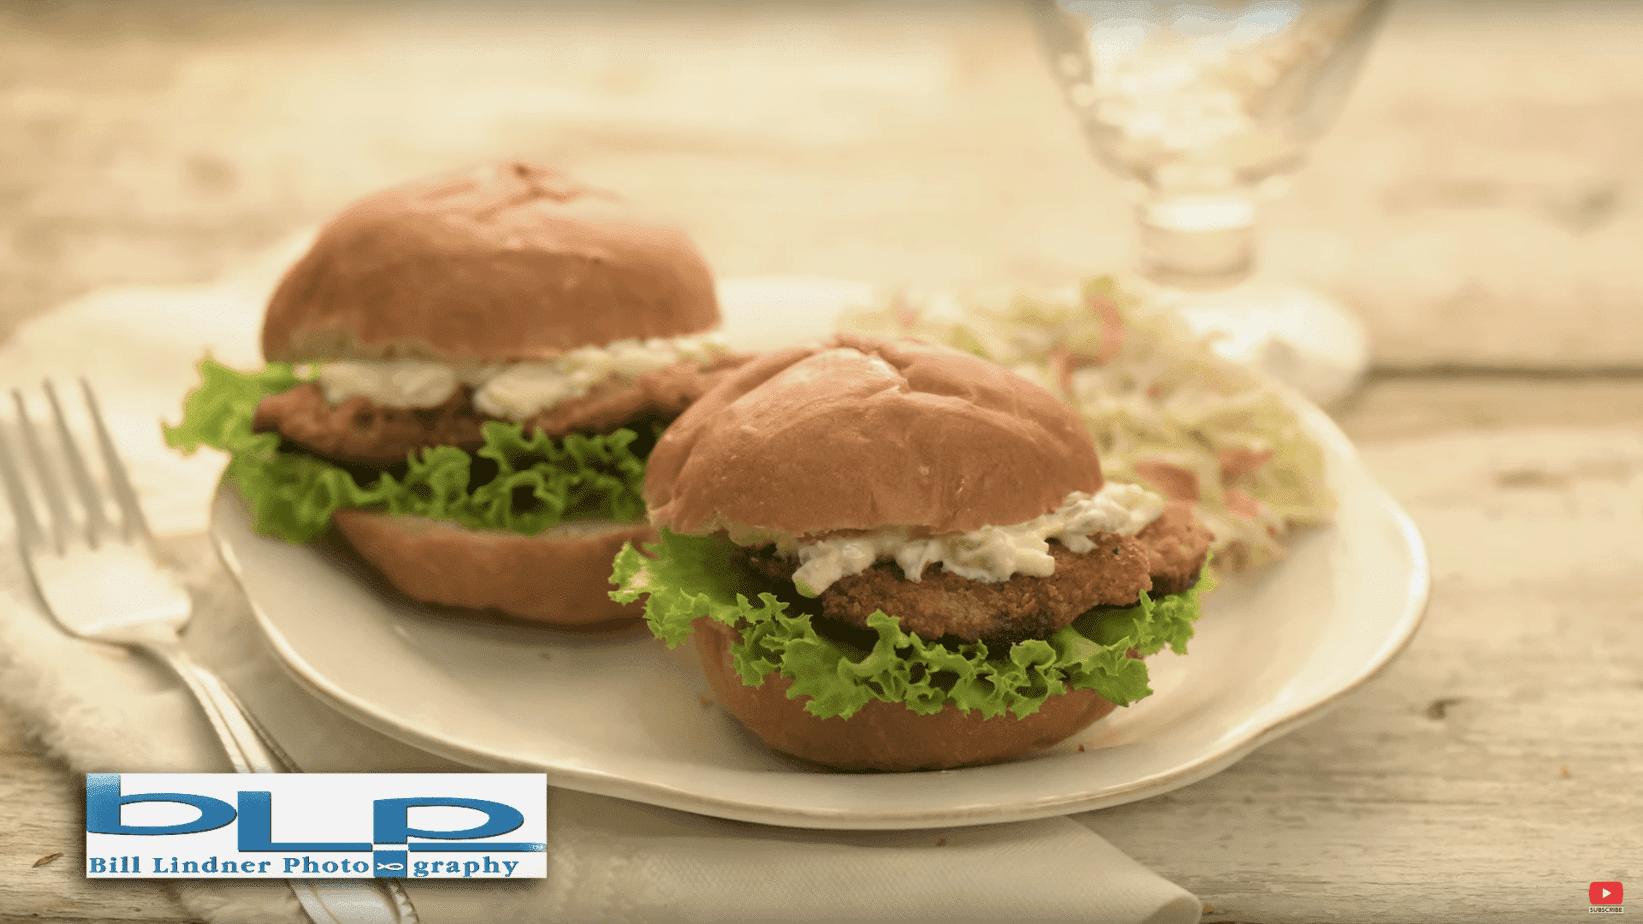 Bluegill Slider Recipe (step-by-step)